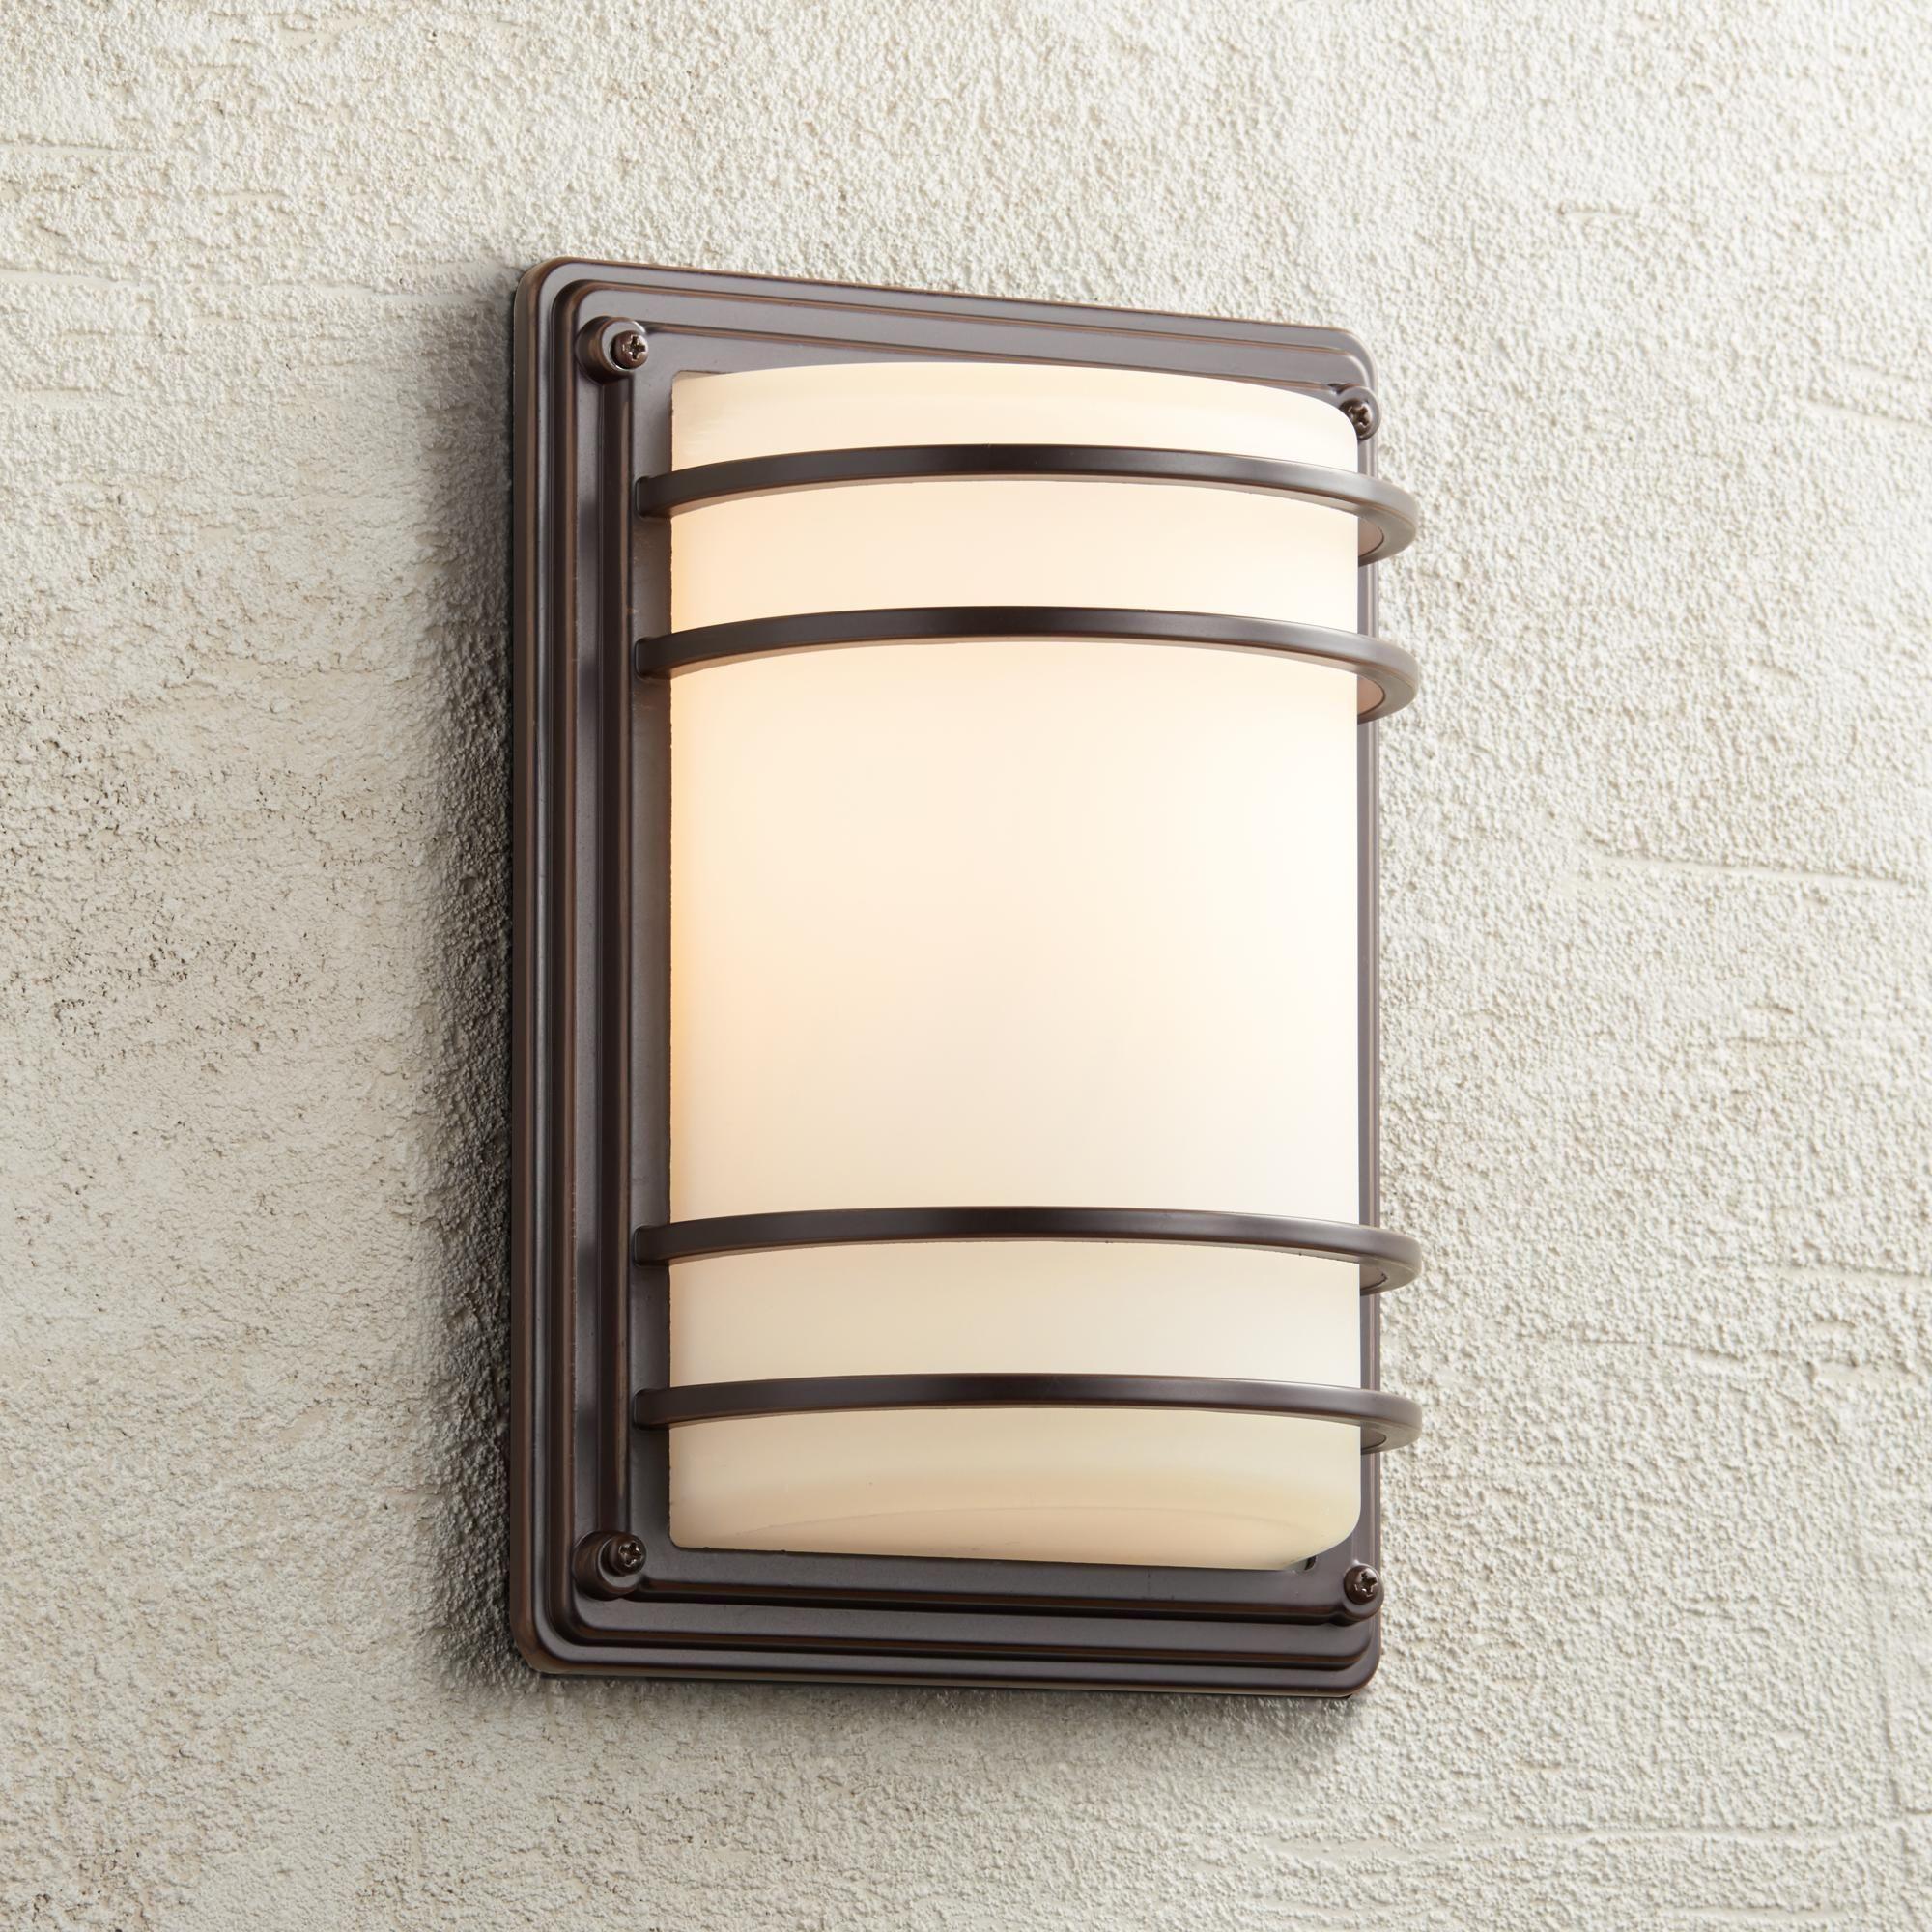 Habitat 11 Inch High Bronze And Opal Glass Outdoor Wall Light Outdoor Wall Light Fixtures Outdoor Wall Lighting Wall Lights